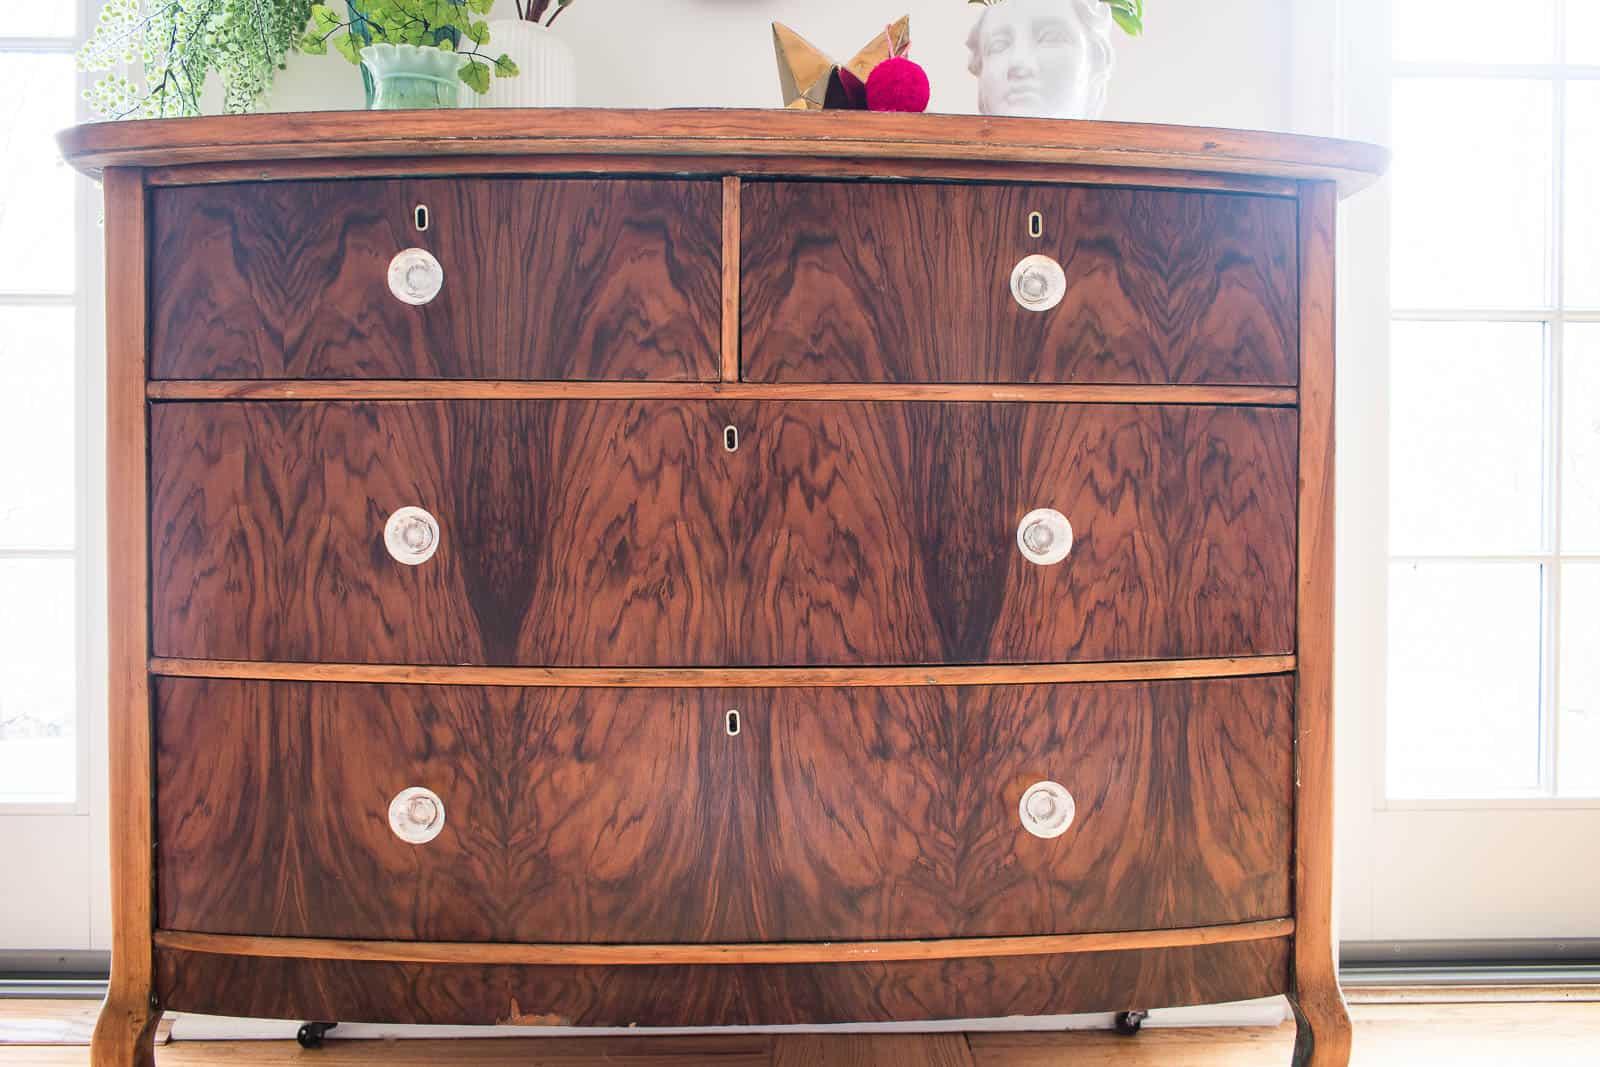 stripped wood dresser